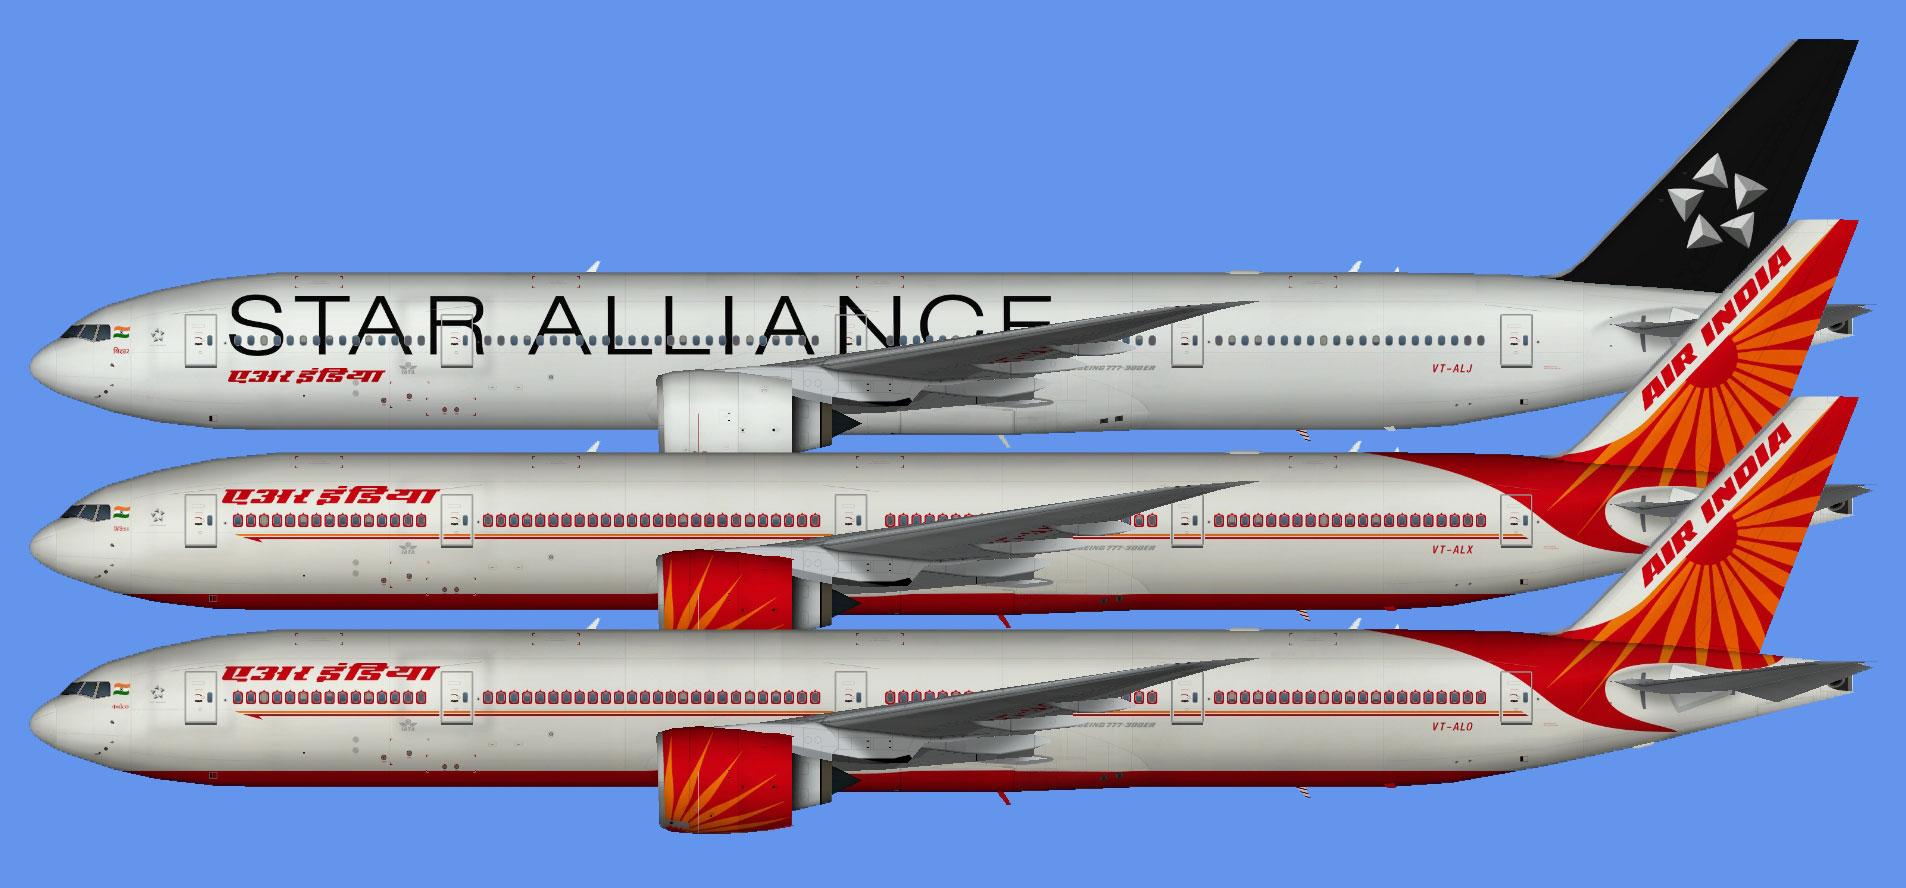 Air India - The Flying Carpet Hub